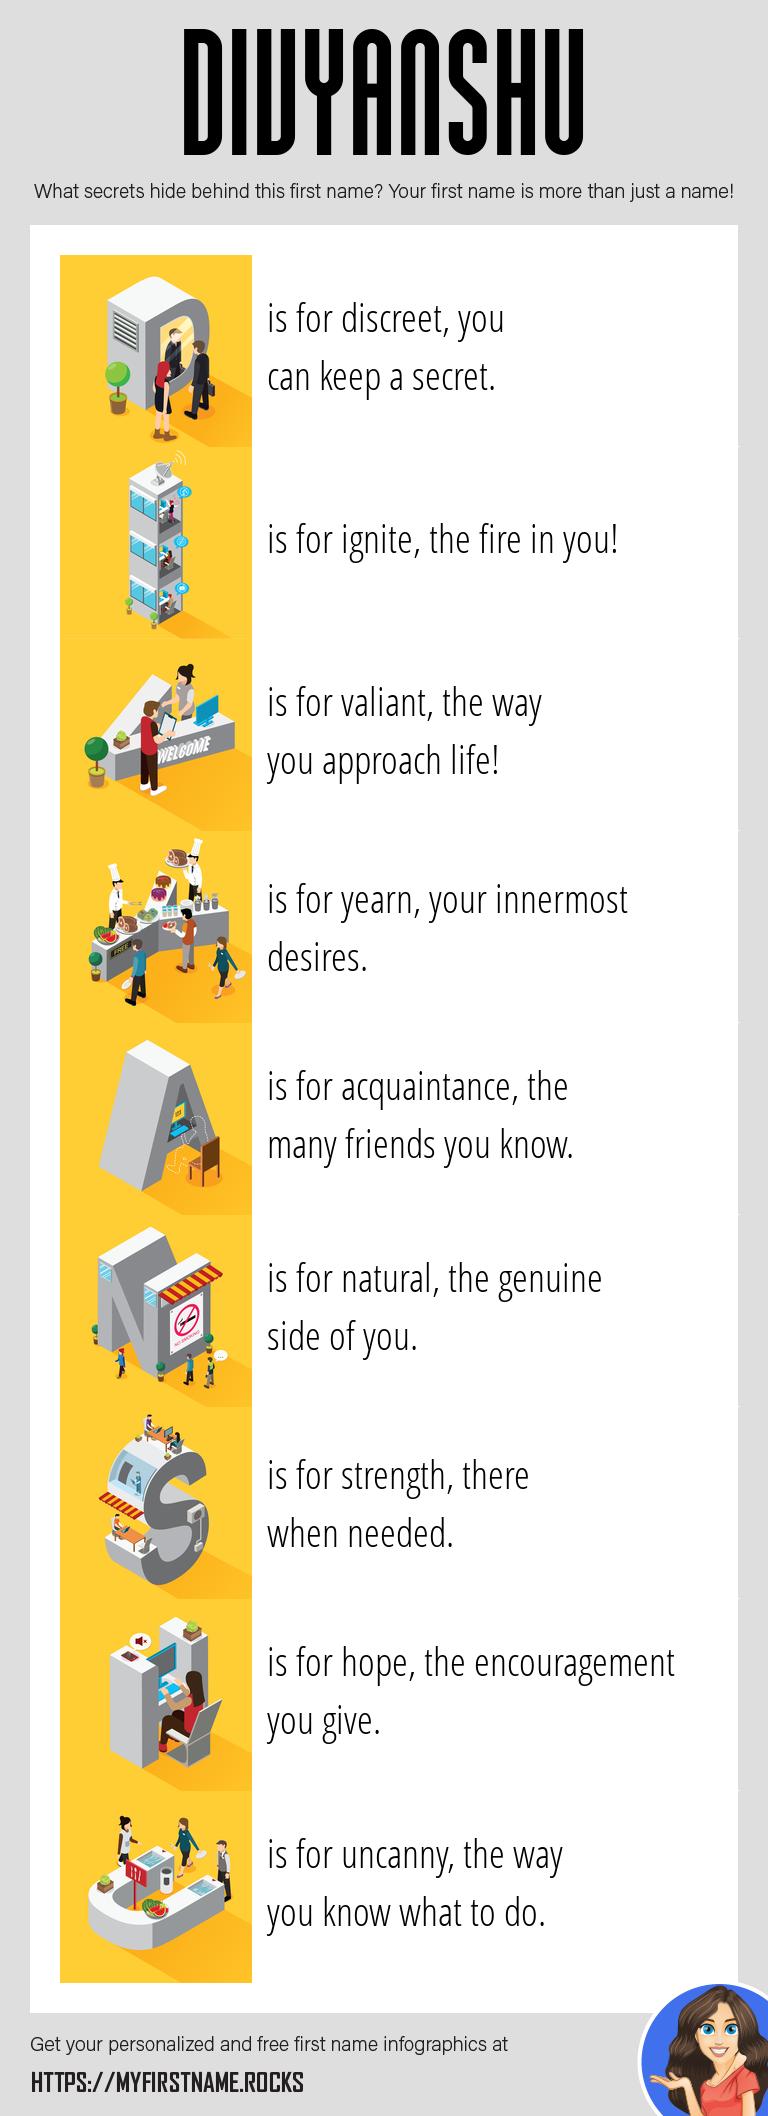 Divyanshu Infographics